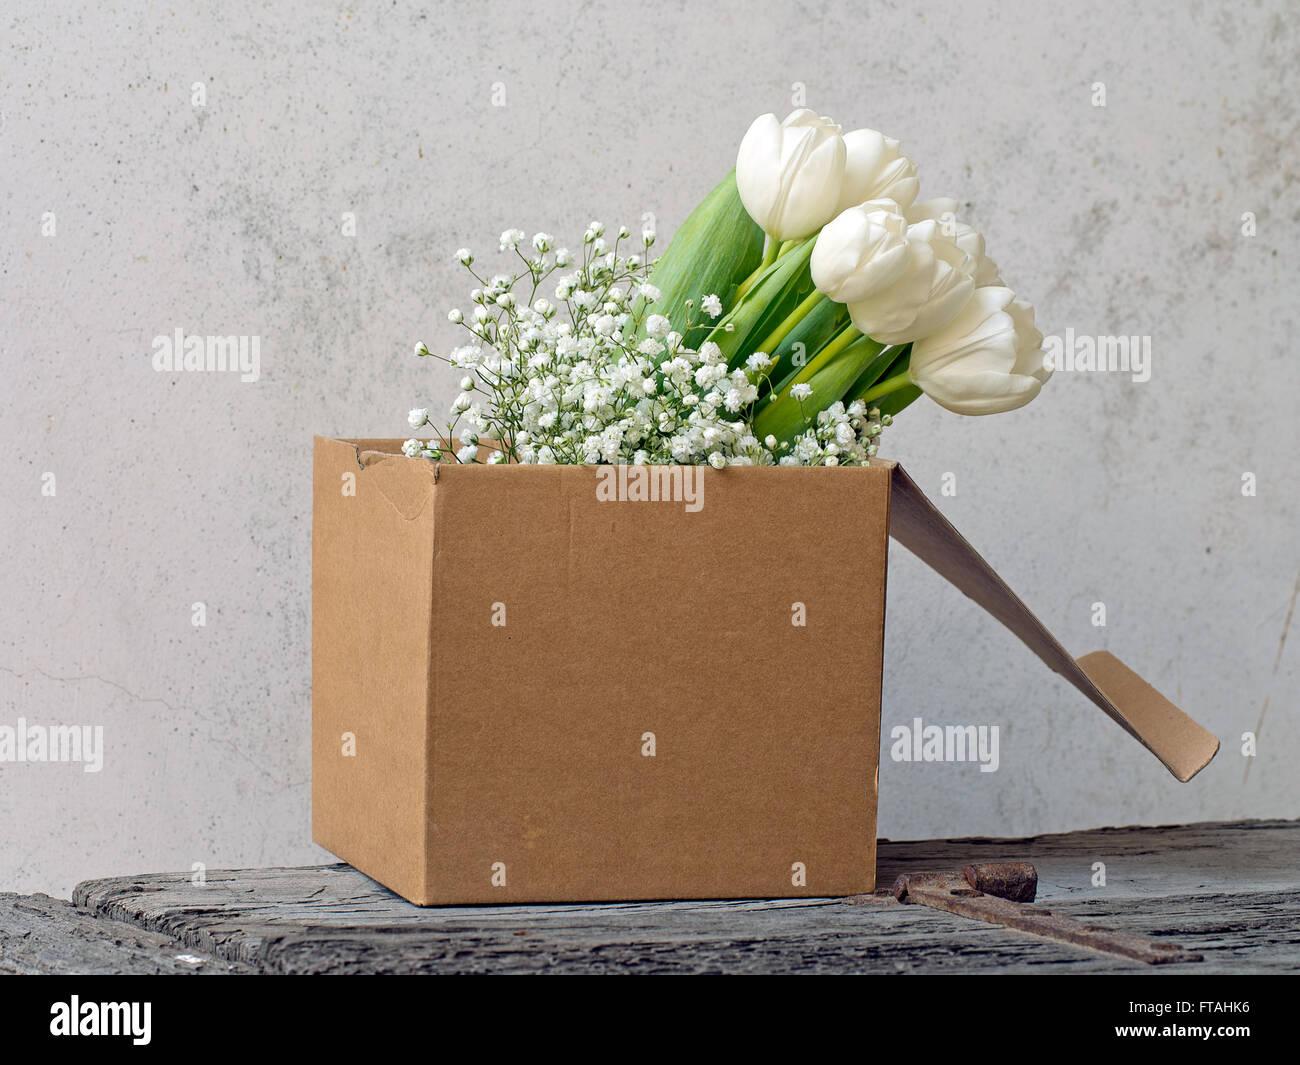 shabby chic stockfotos shabby chic bilder alamy. Black Bedroom Furniture Sets. Home Design Ideas